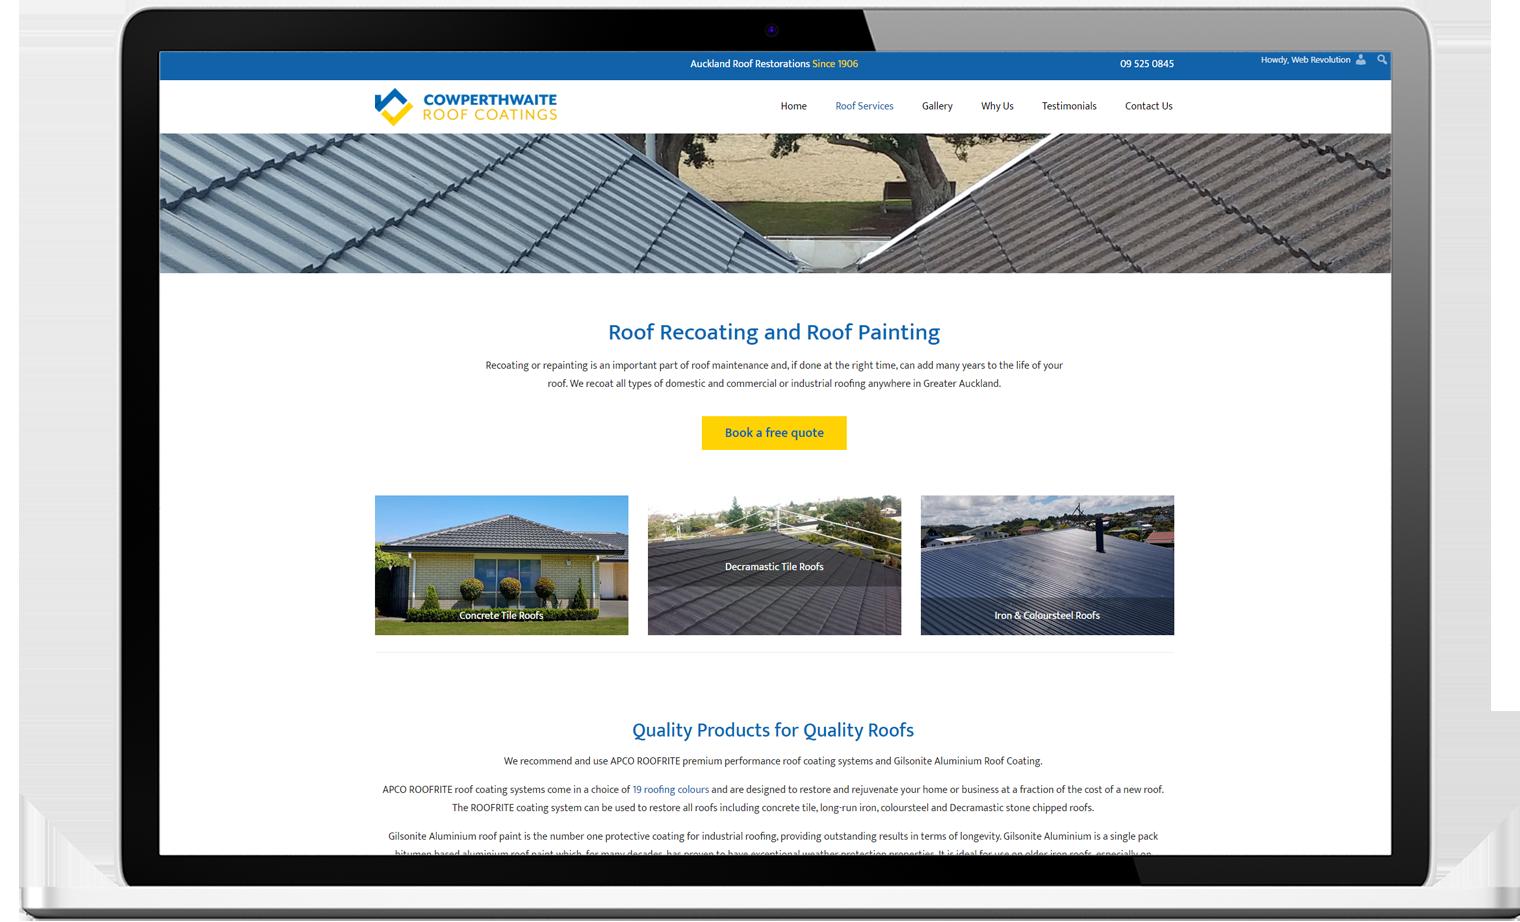 Cowperthwaite Website Re design Desktop - Cowperthwaite Roof Coatings Website and logo design